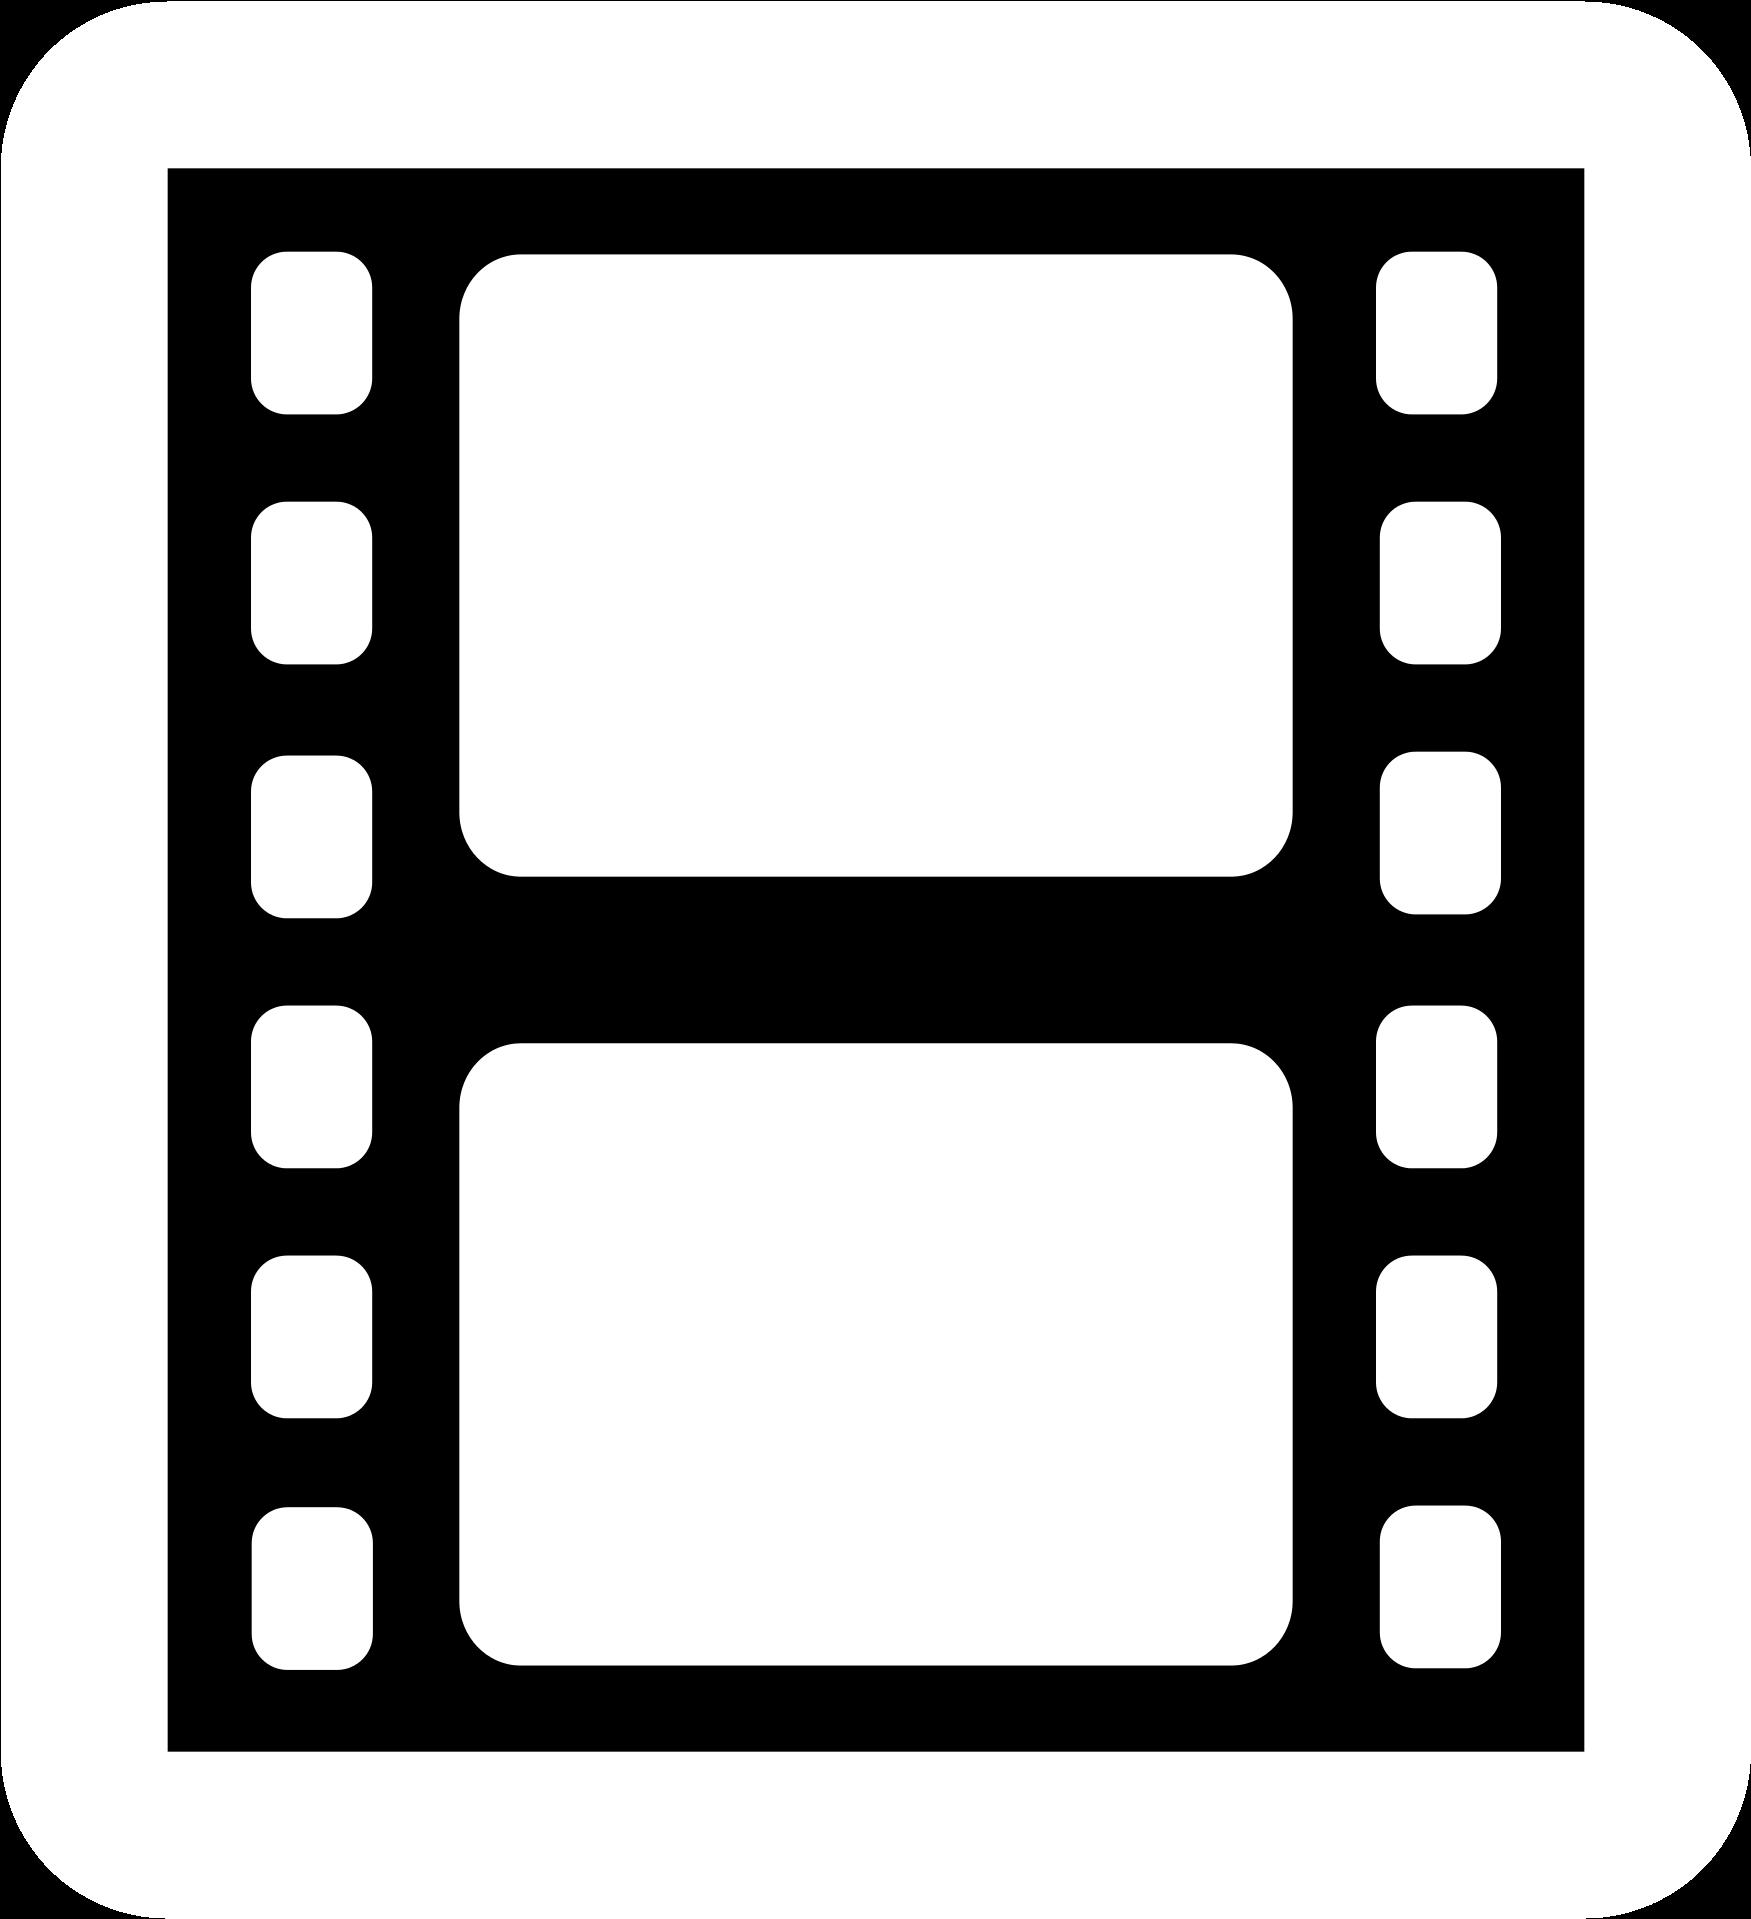 Pin by Brigittegege on Clipart | Digi stamps, Movie room, Film strip